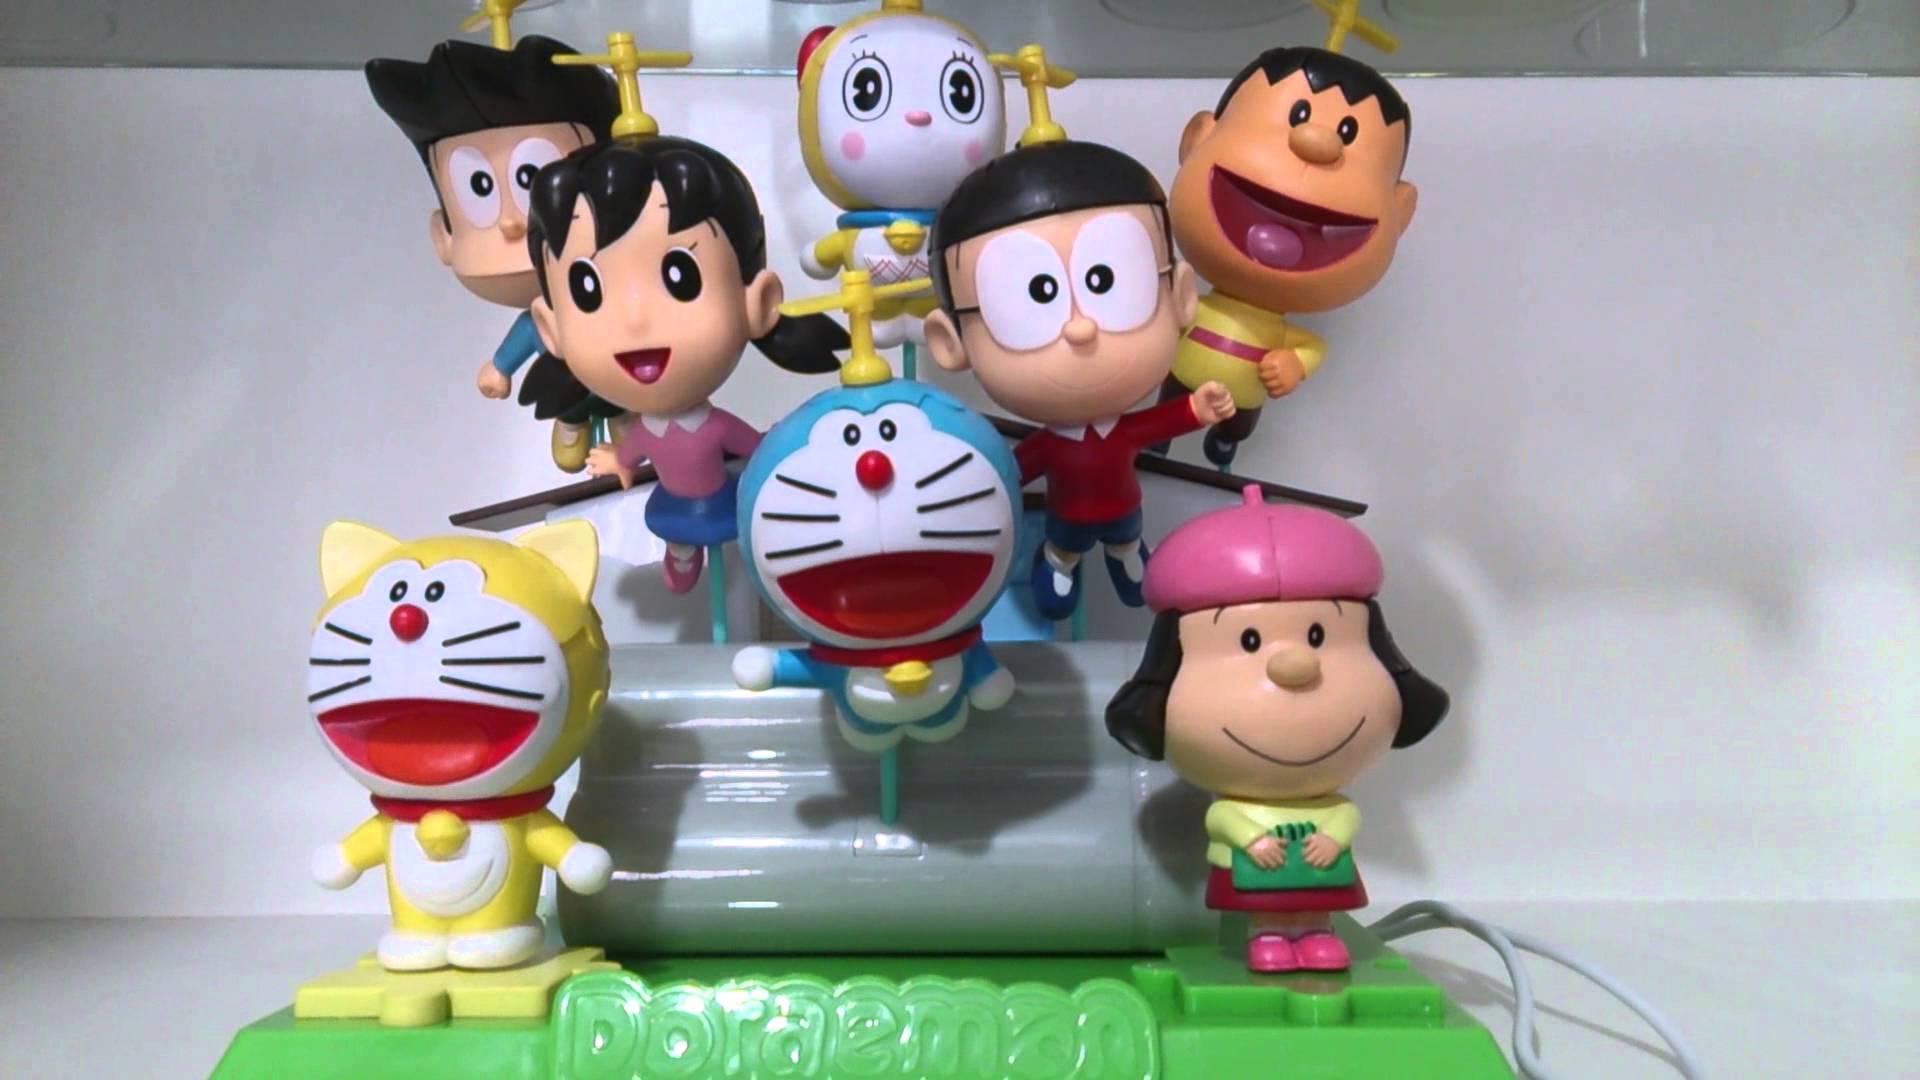 Doraemon 3d wallpapers 2016 wallpaper cave malaysia shell select doraemon friends 3d puzzle collection voltagebd Images